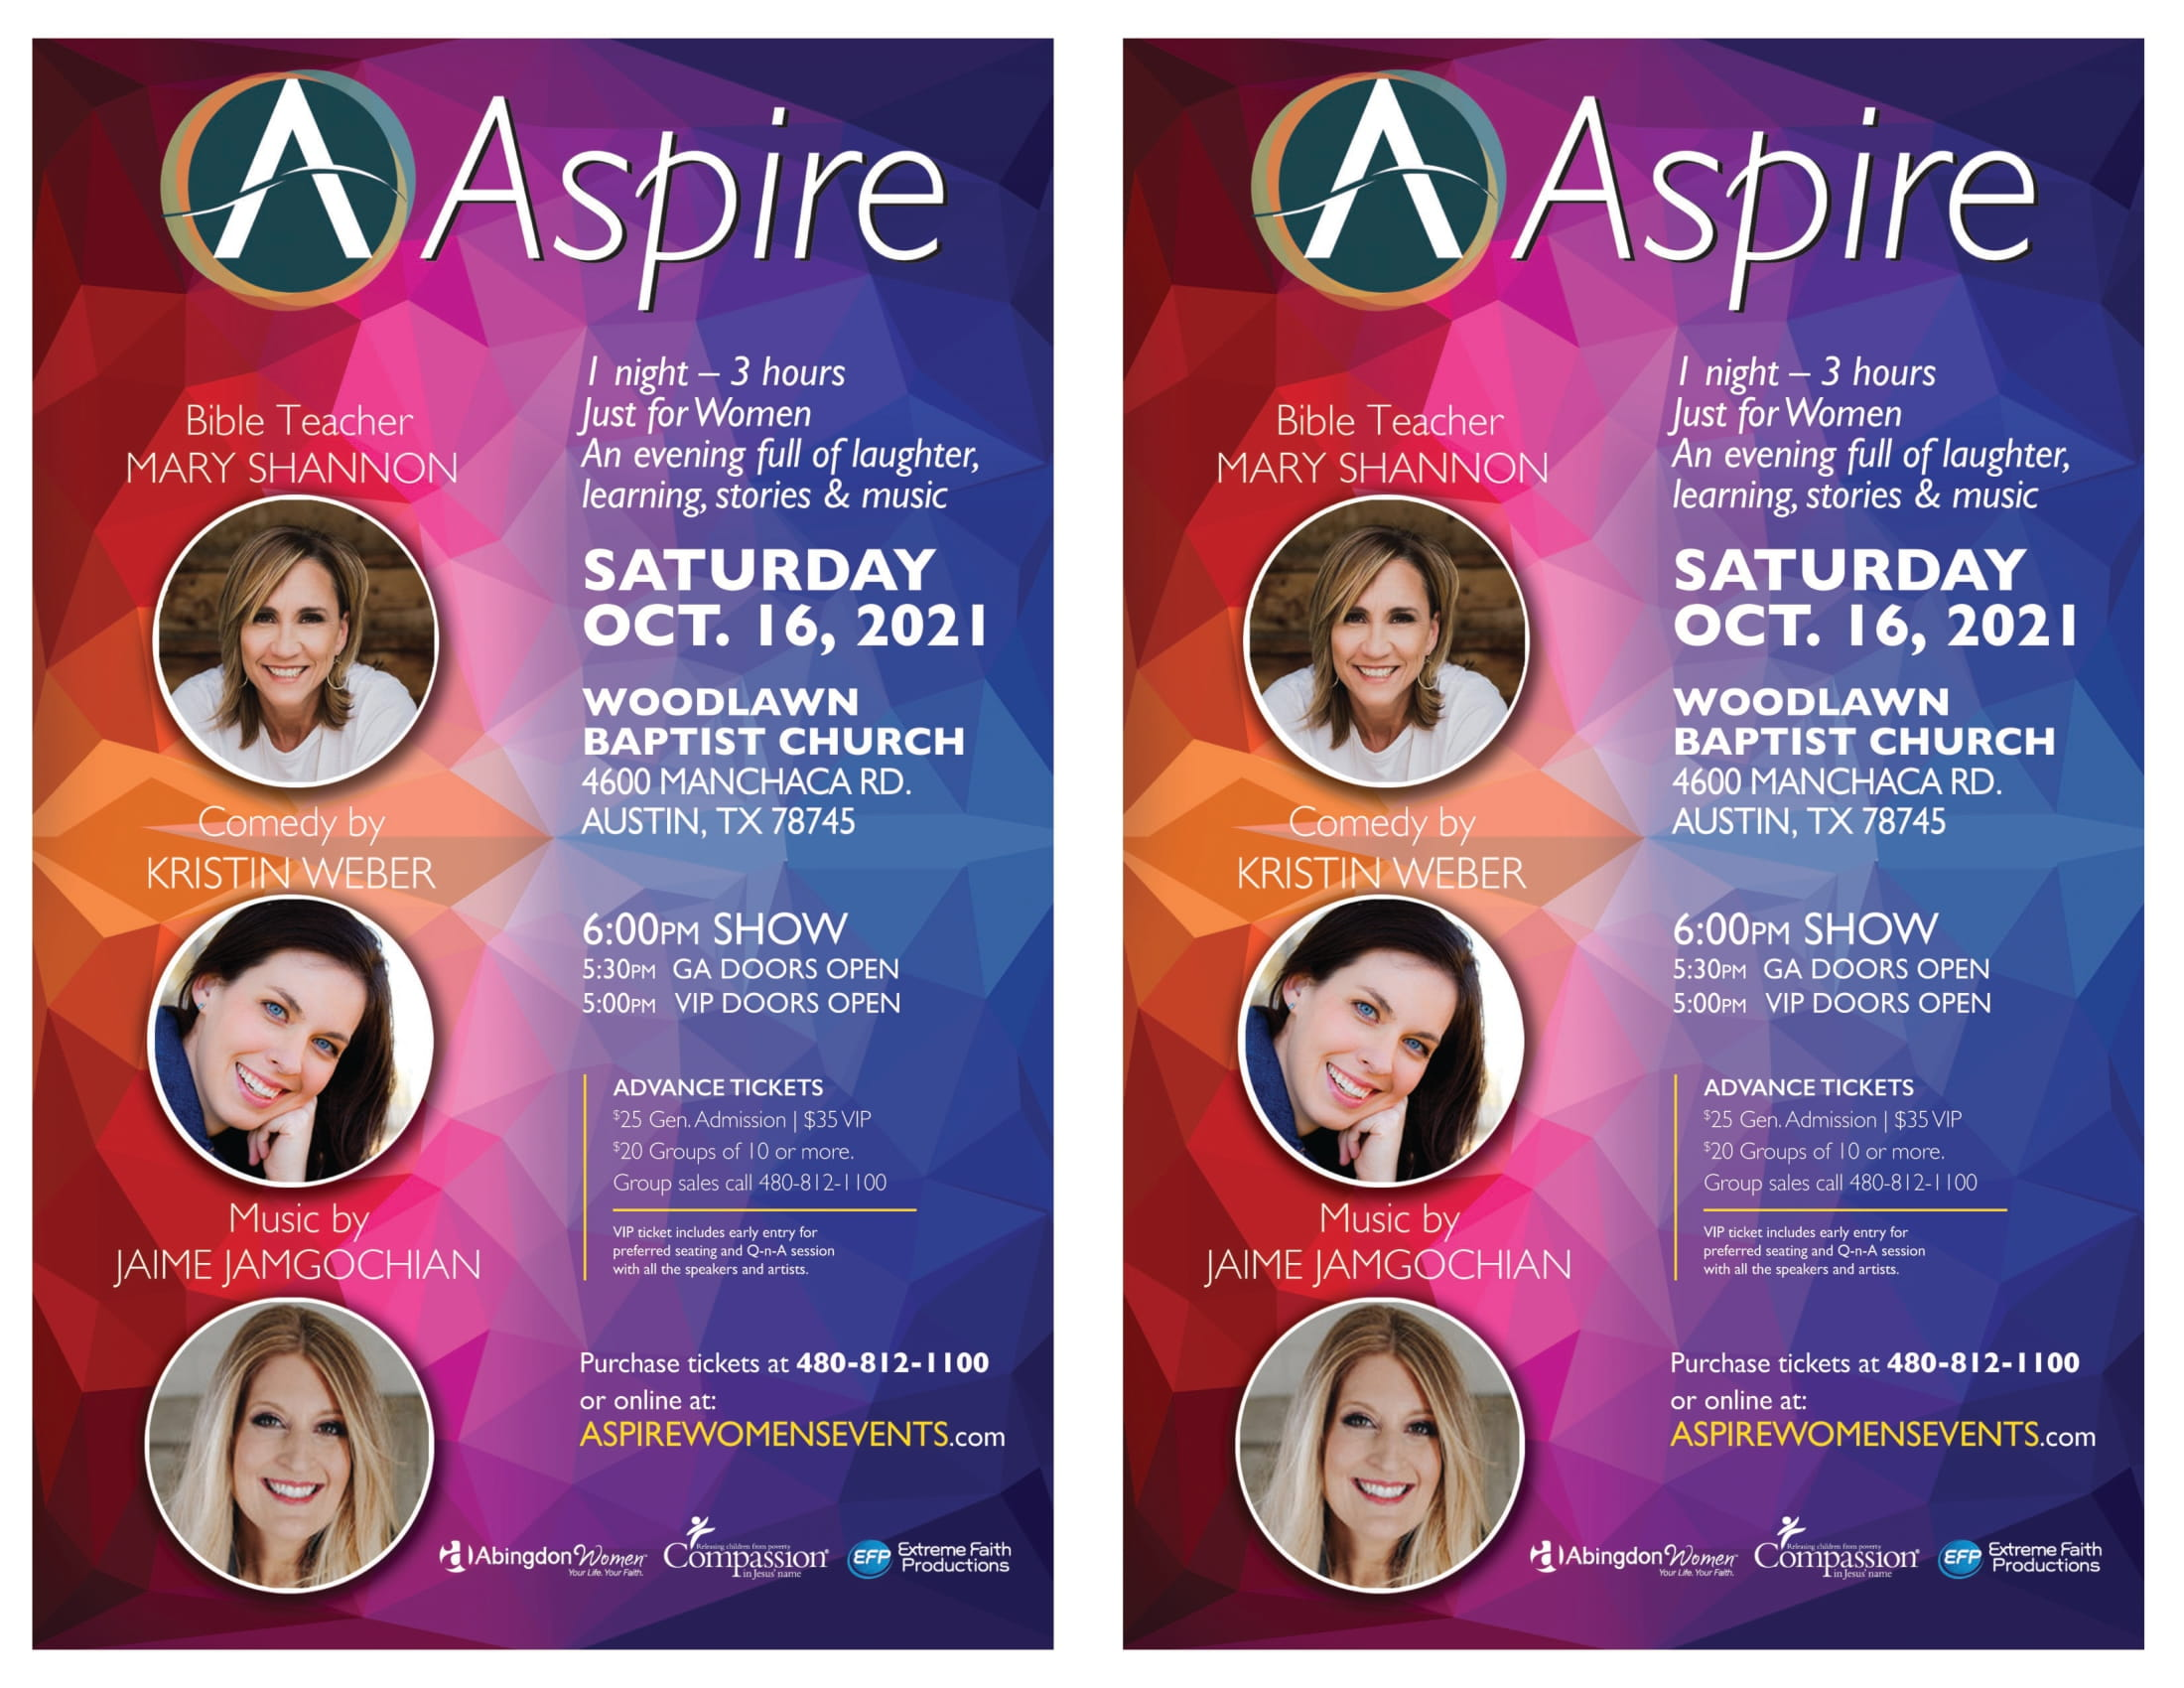 ASPIRE SAT Oct 16 Austin TX-2UP-1